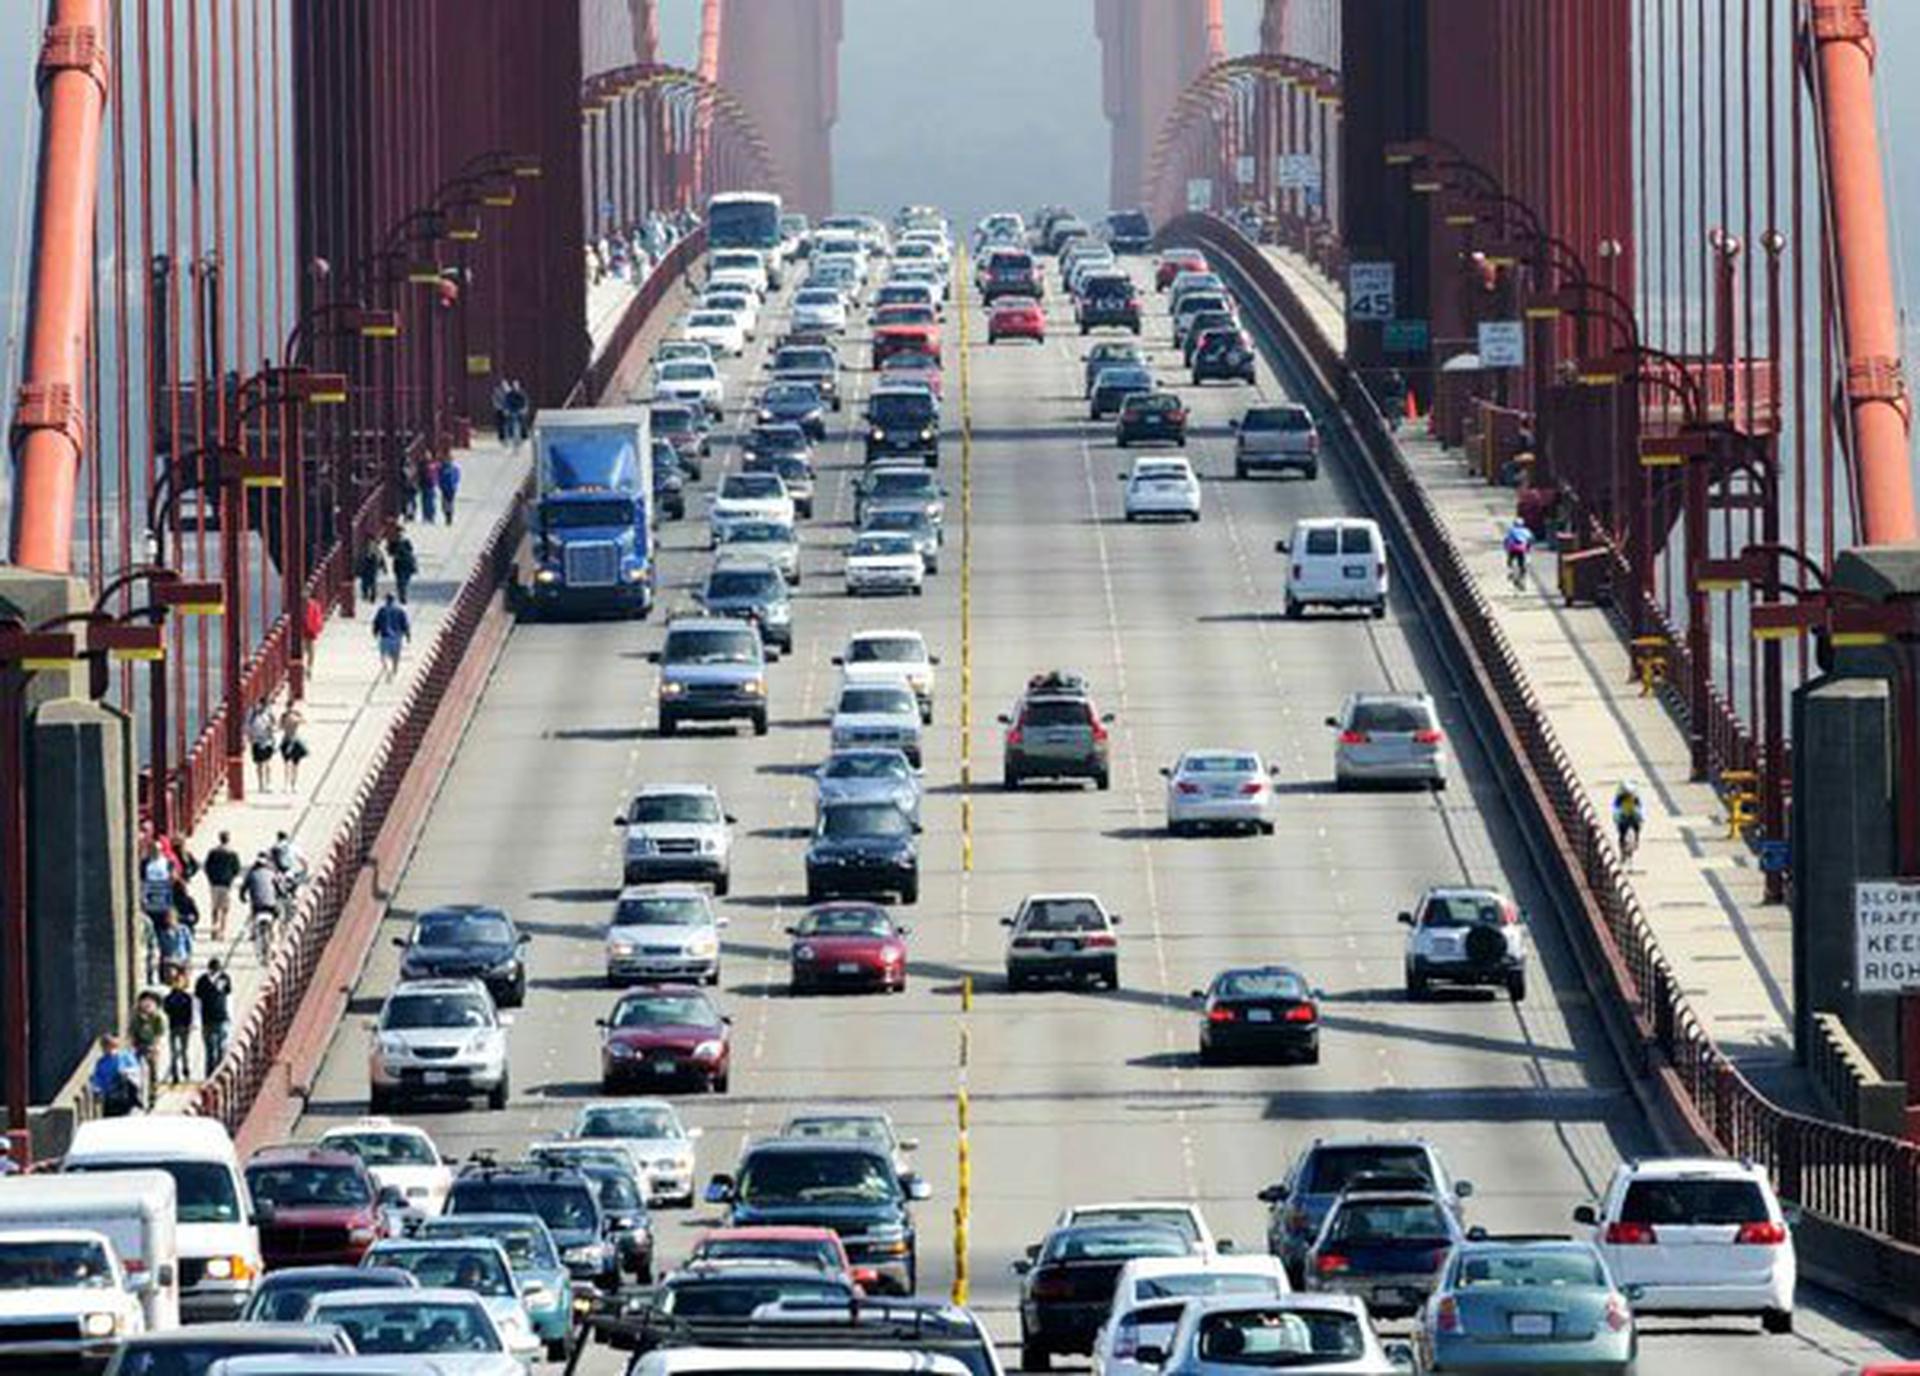 Driving in Heavy Traffic